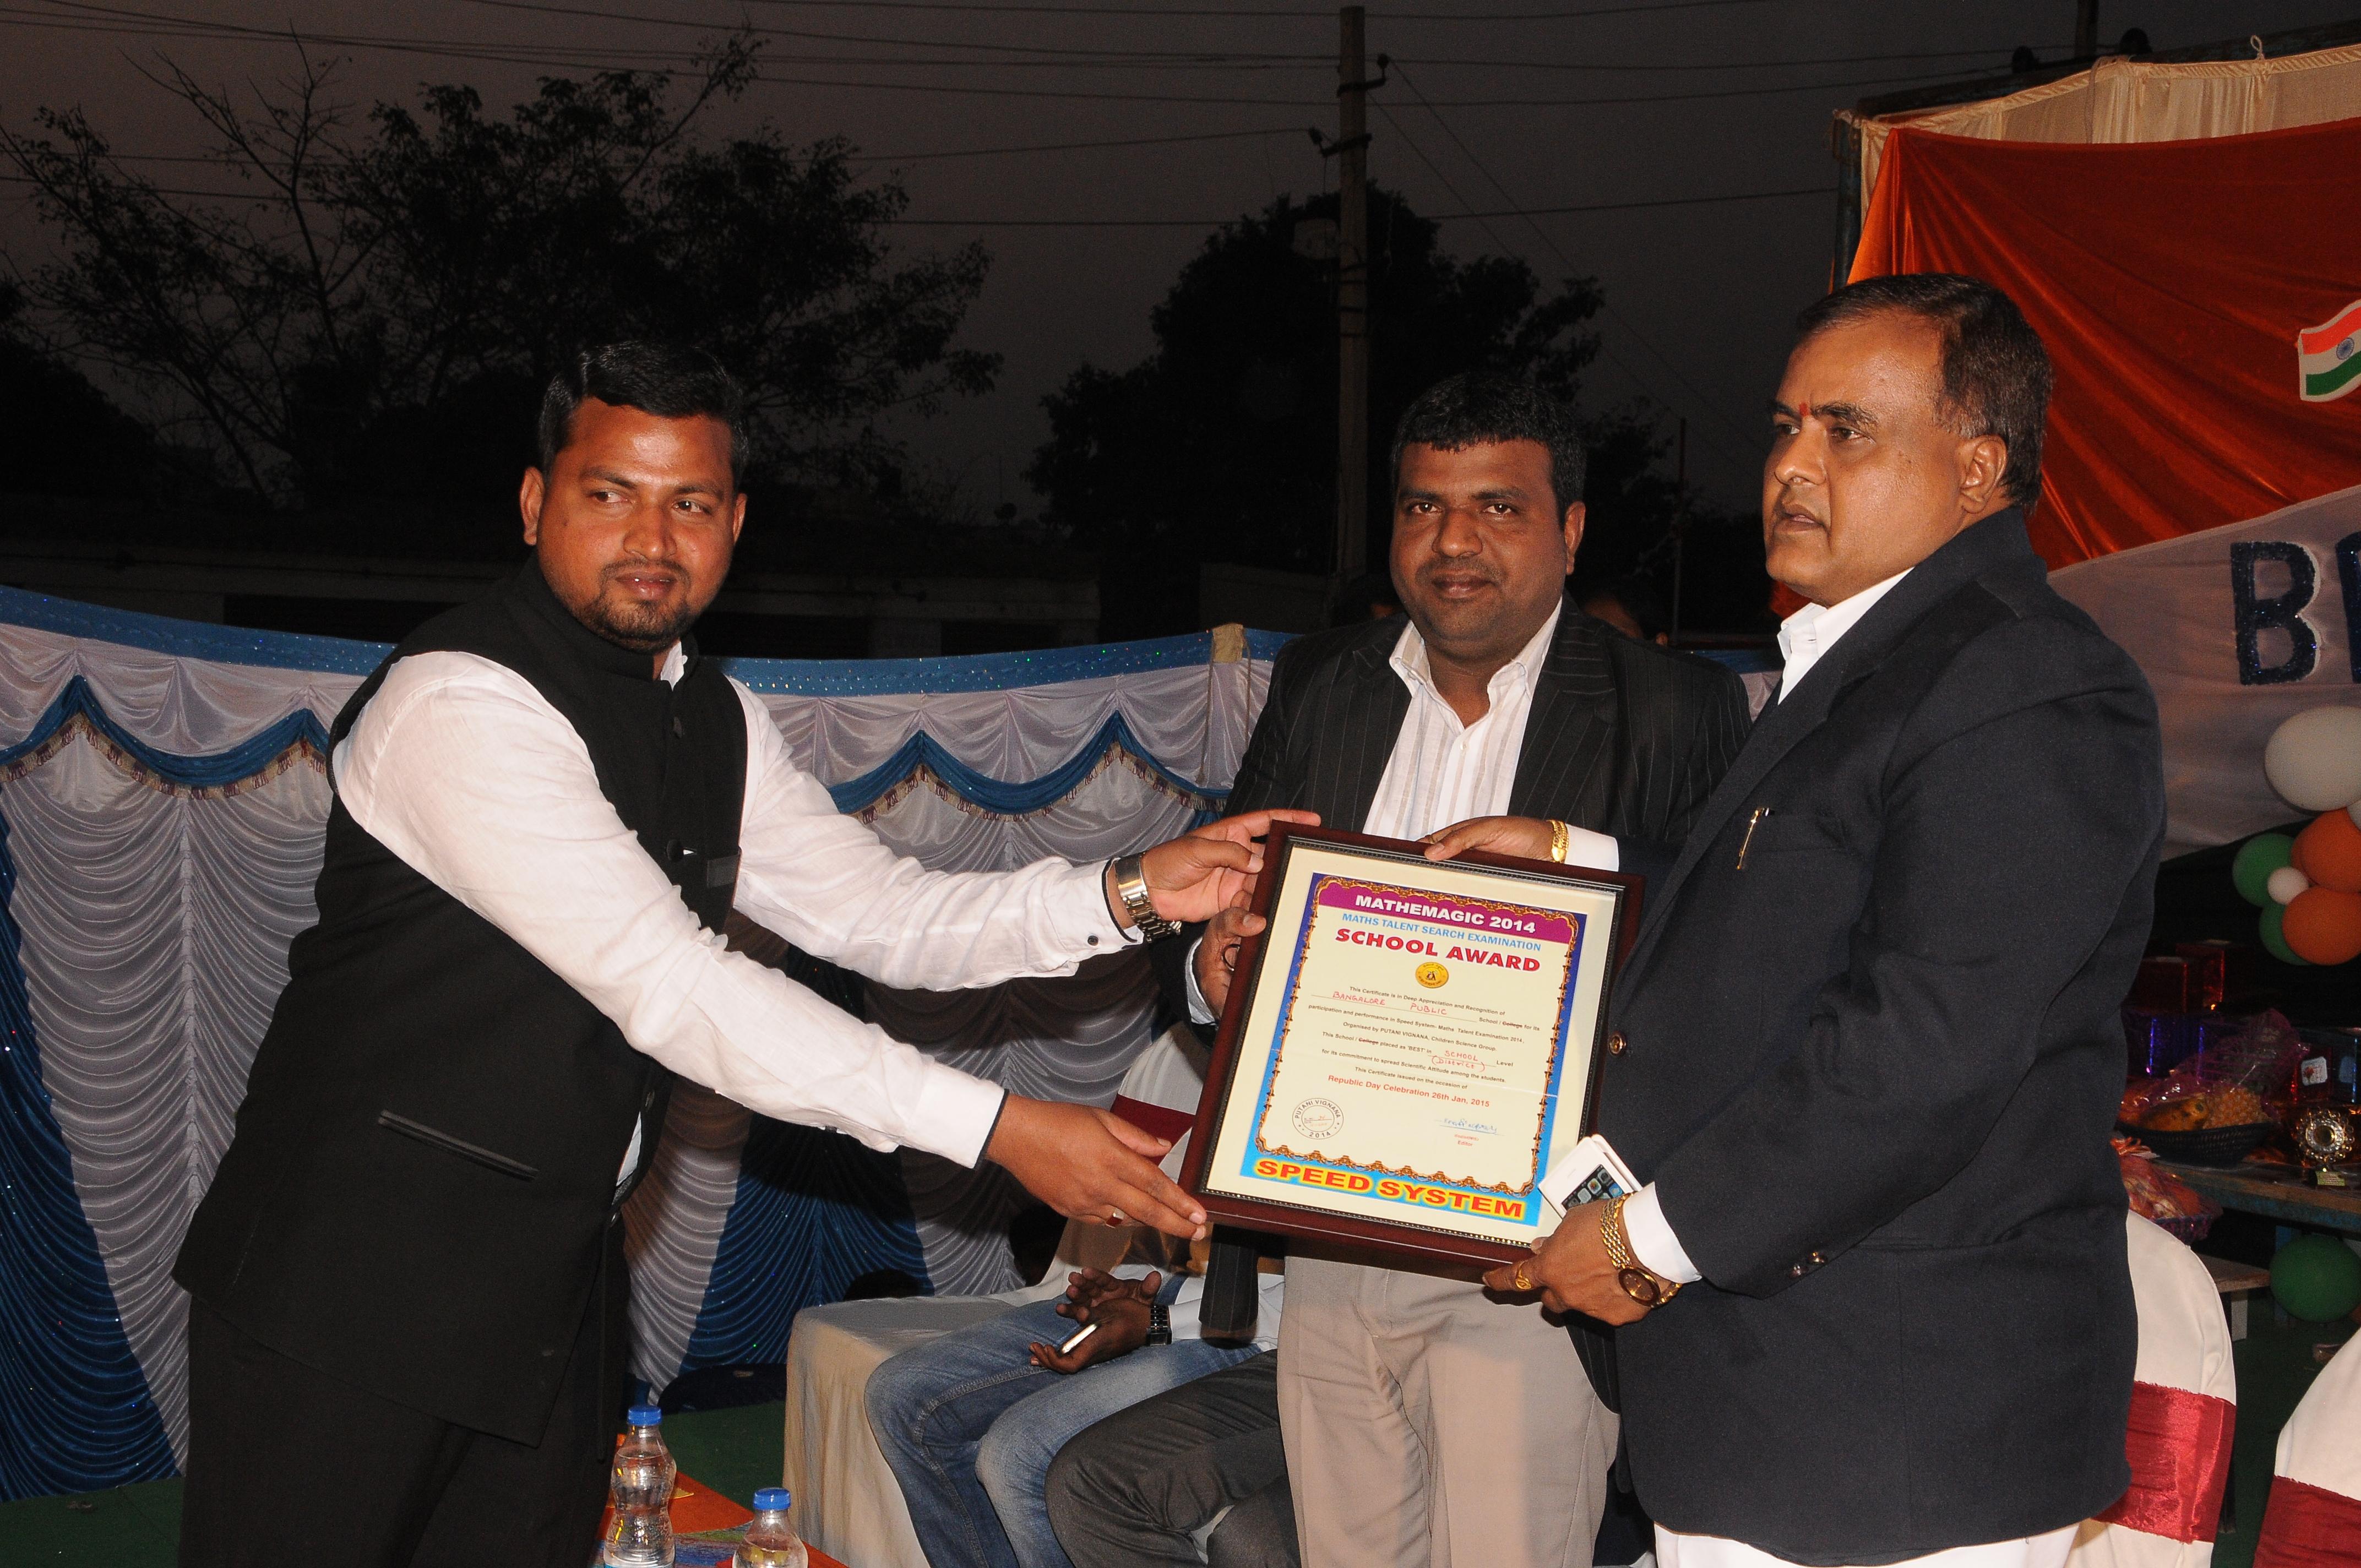 Mathemagic 2014 award